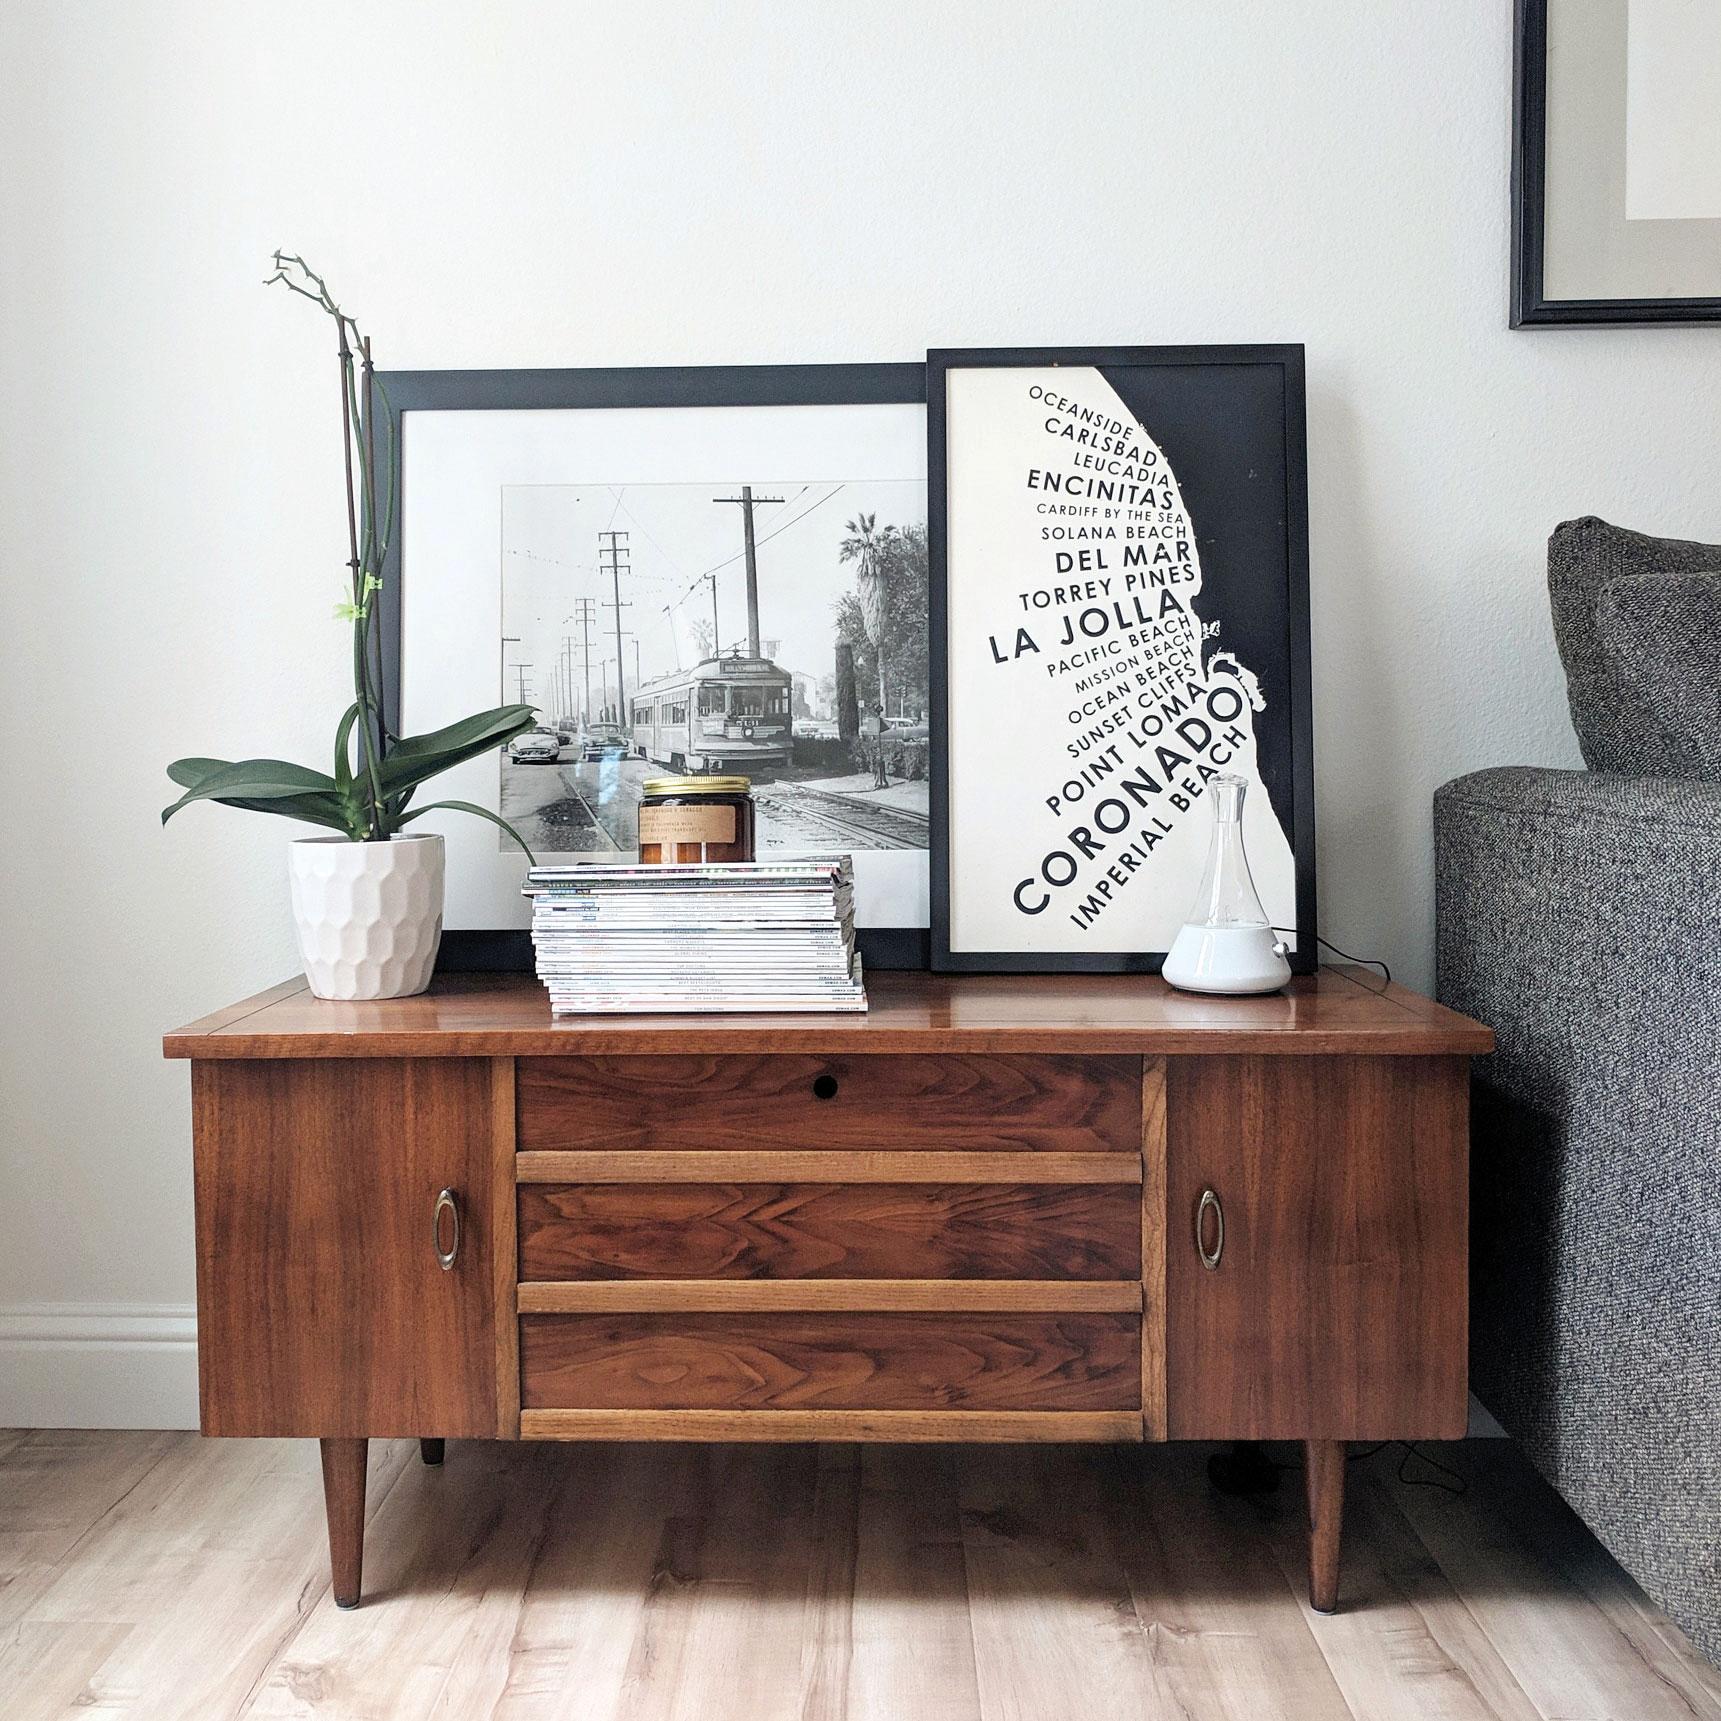 secondhand furniture sustainability kait schulhof san diego facebook marketplace